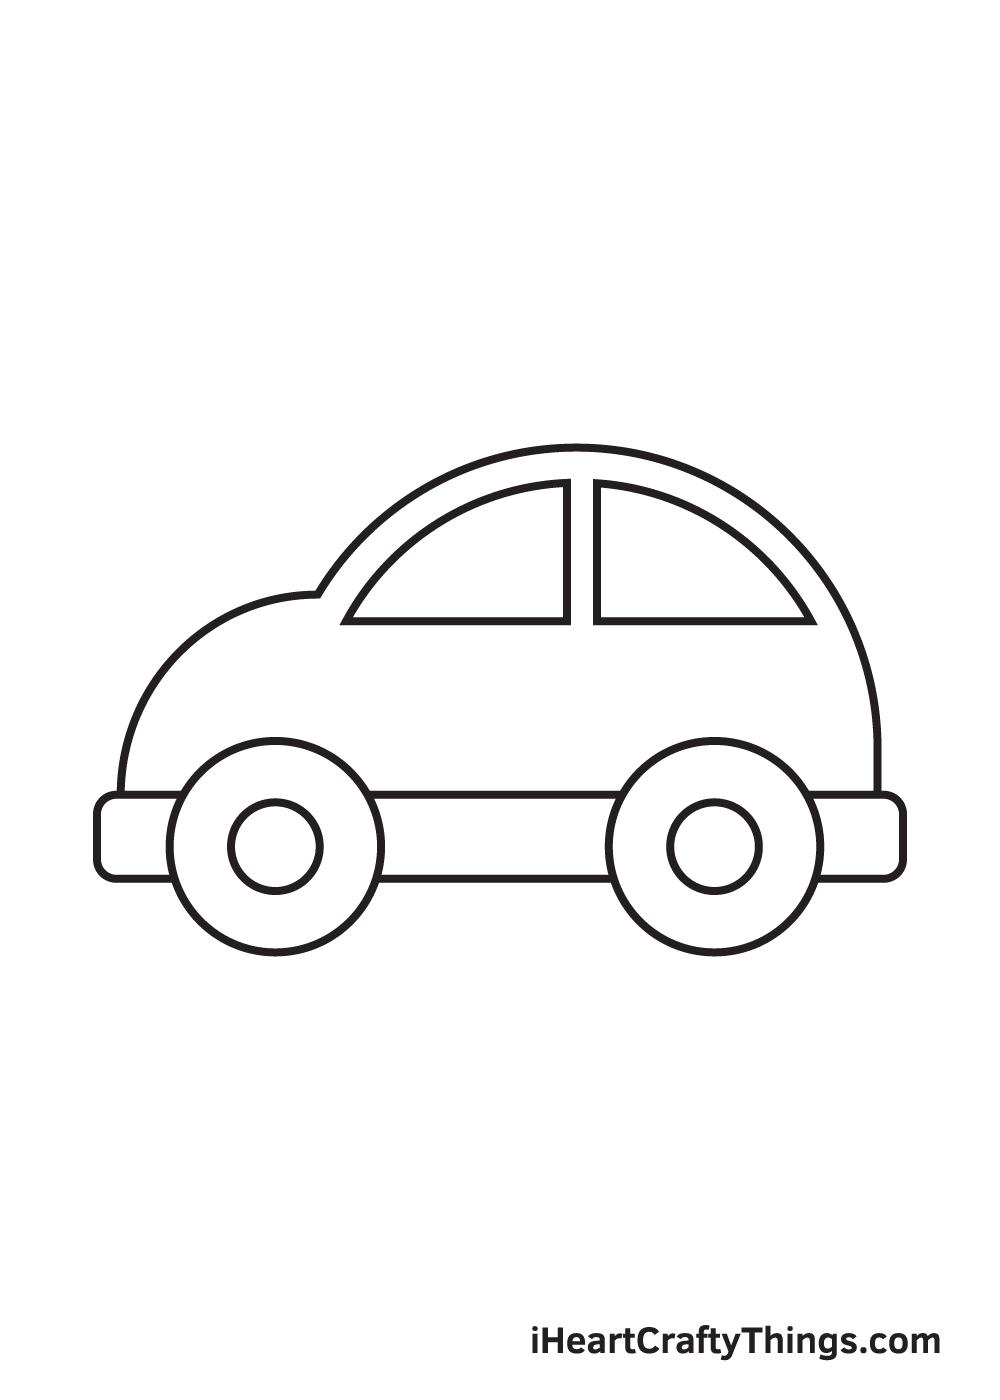 car drawing – step 6